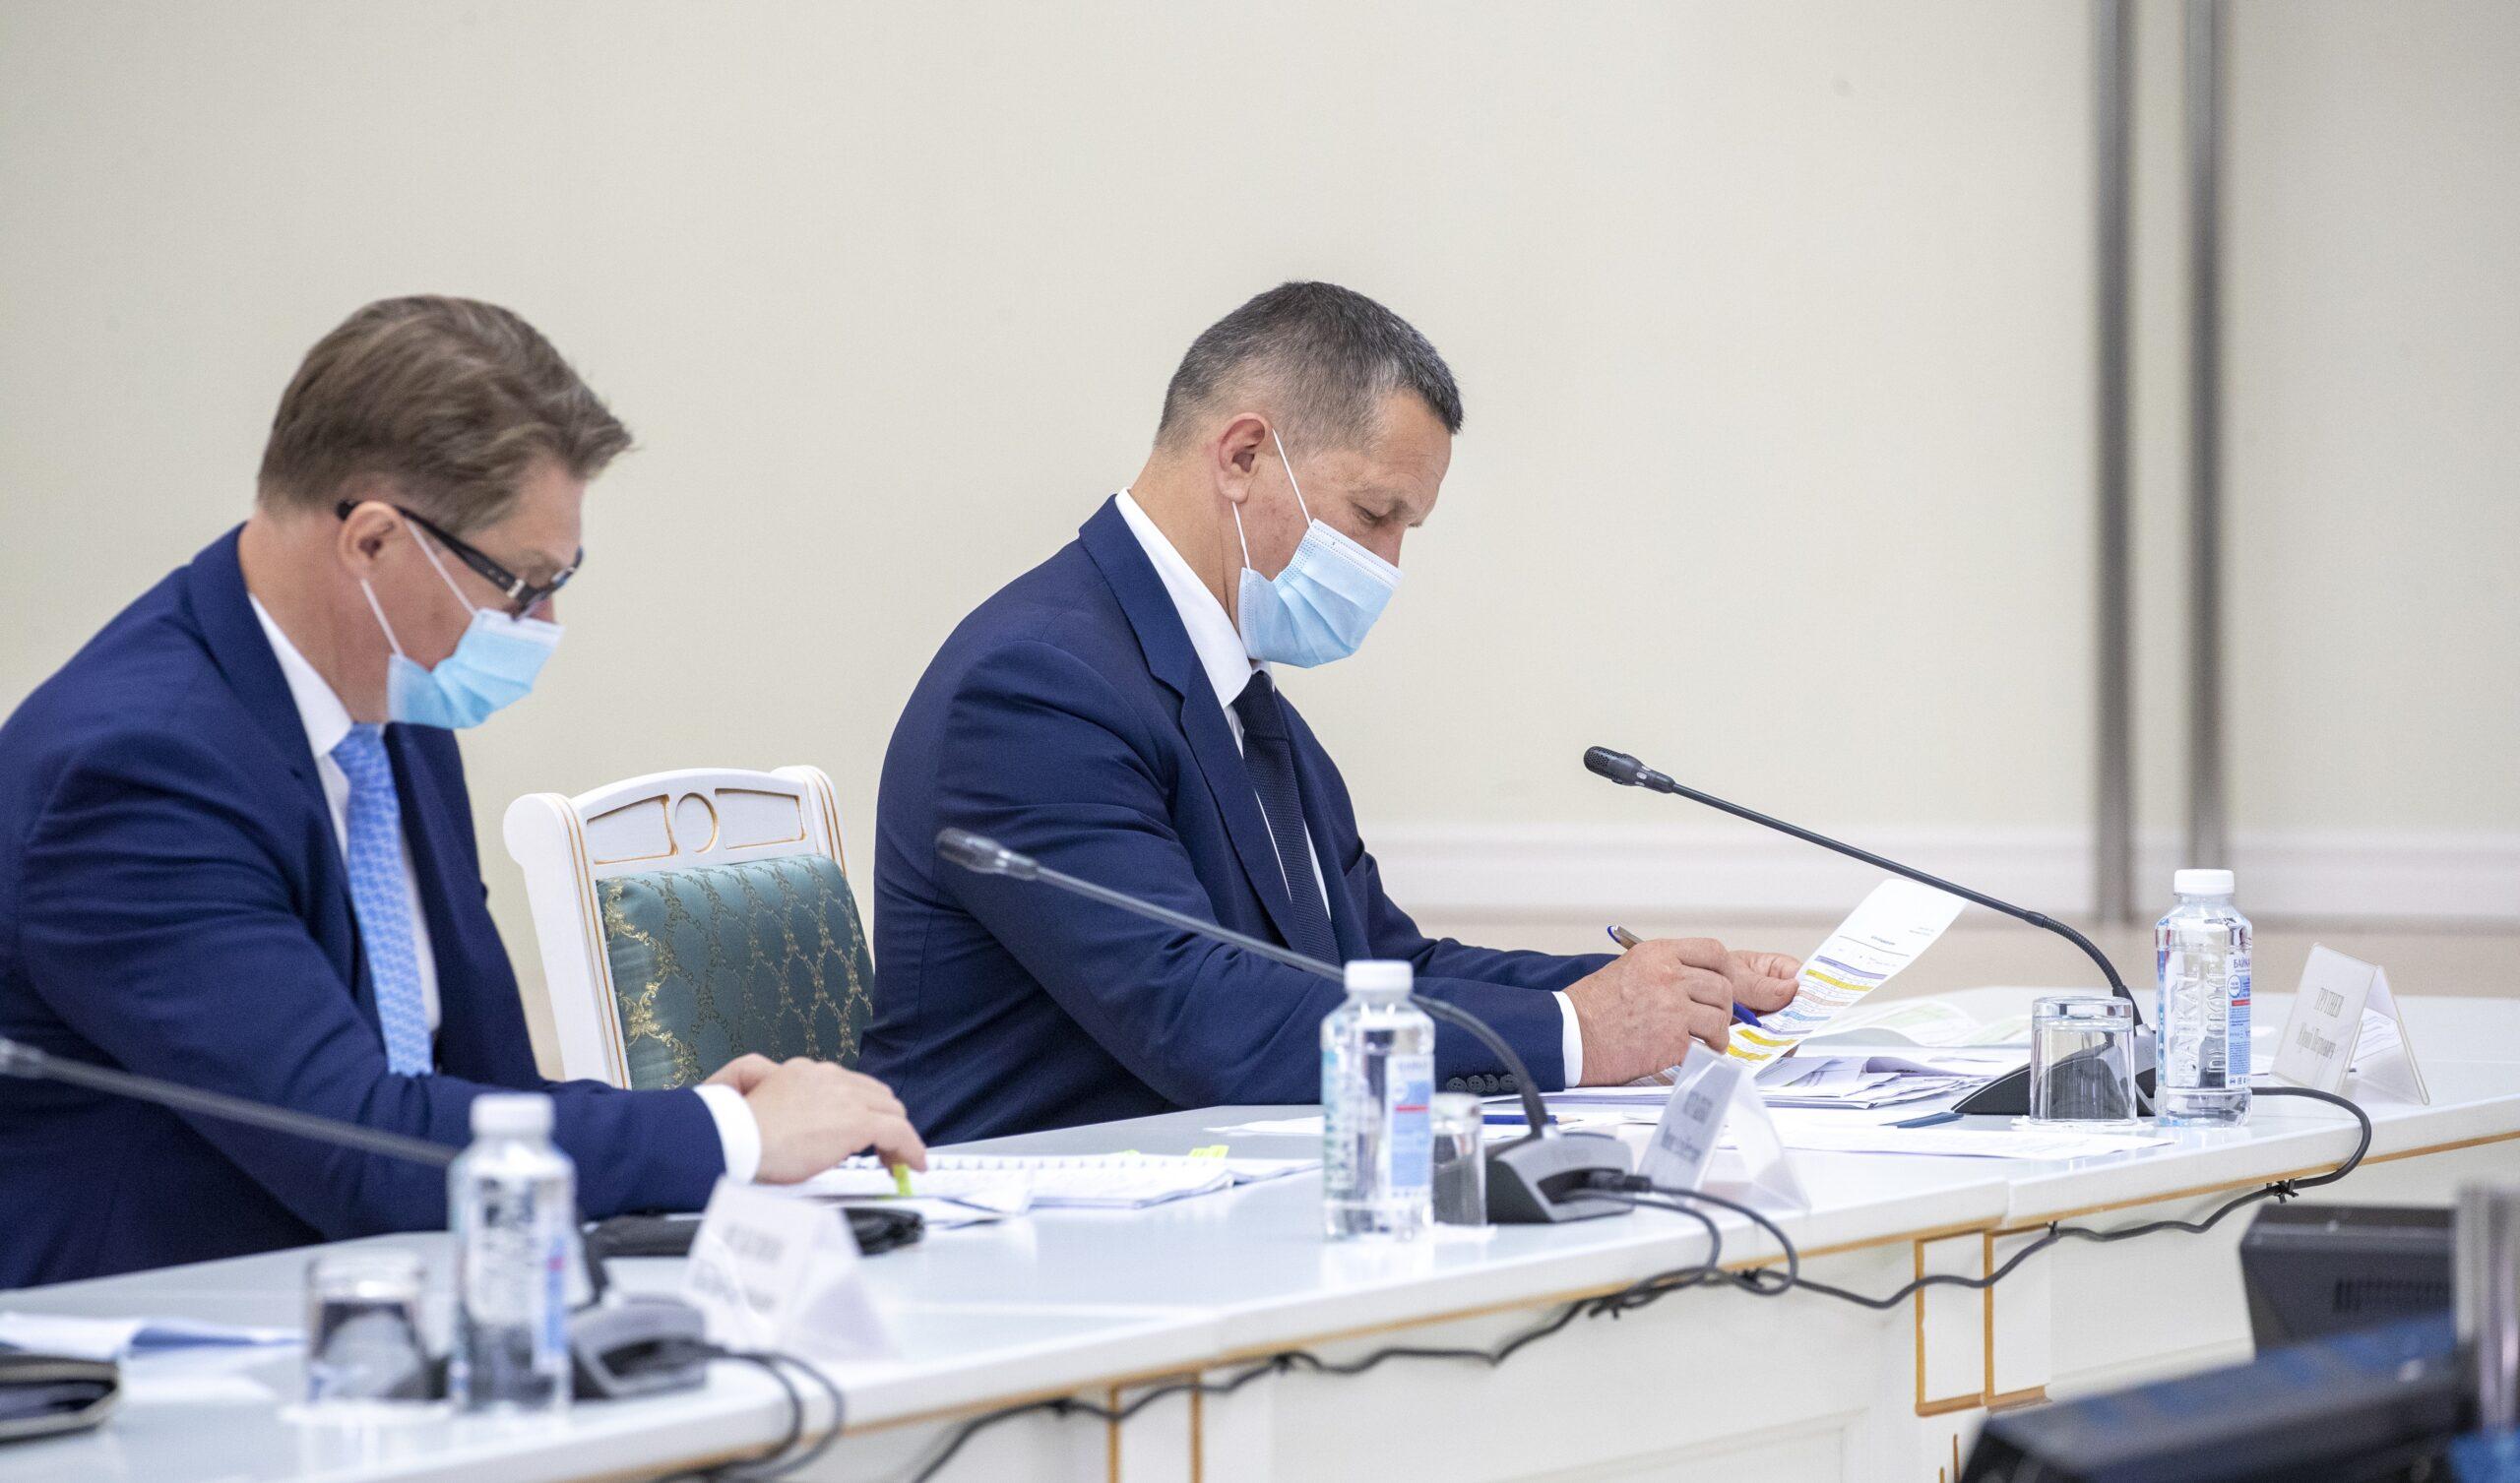 Юрий Трутнев: Ущерб от паводков на территории ДФО удалось снизить в разы